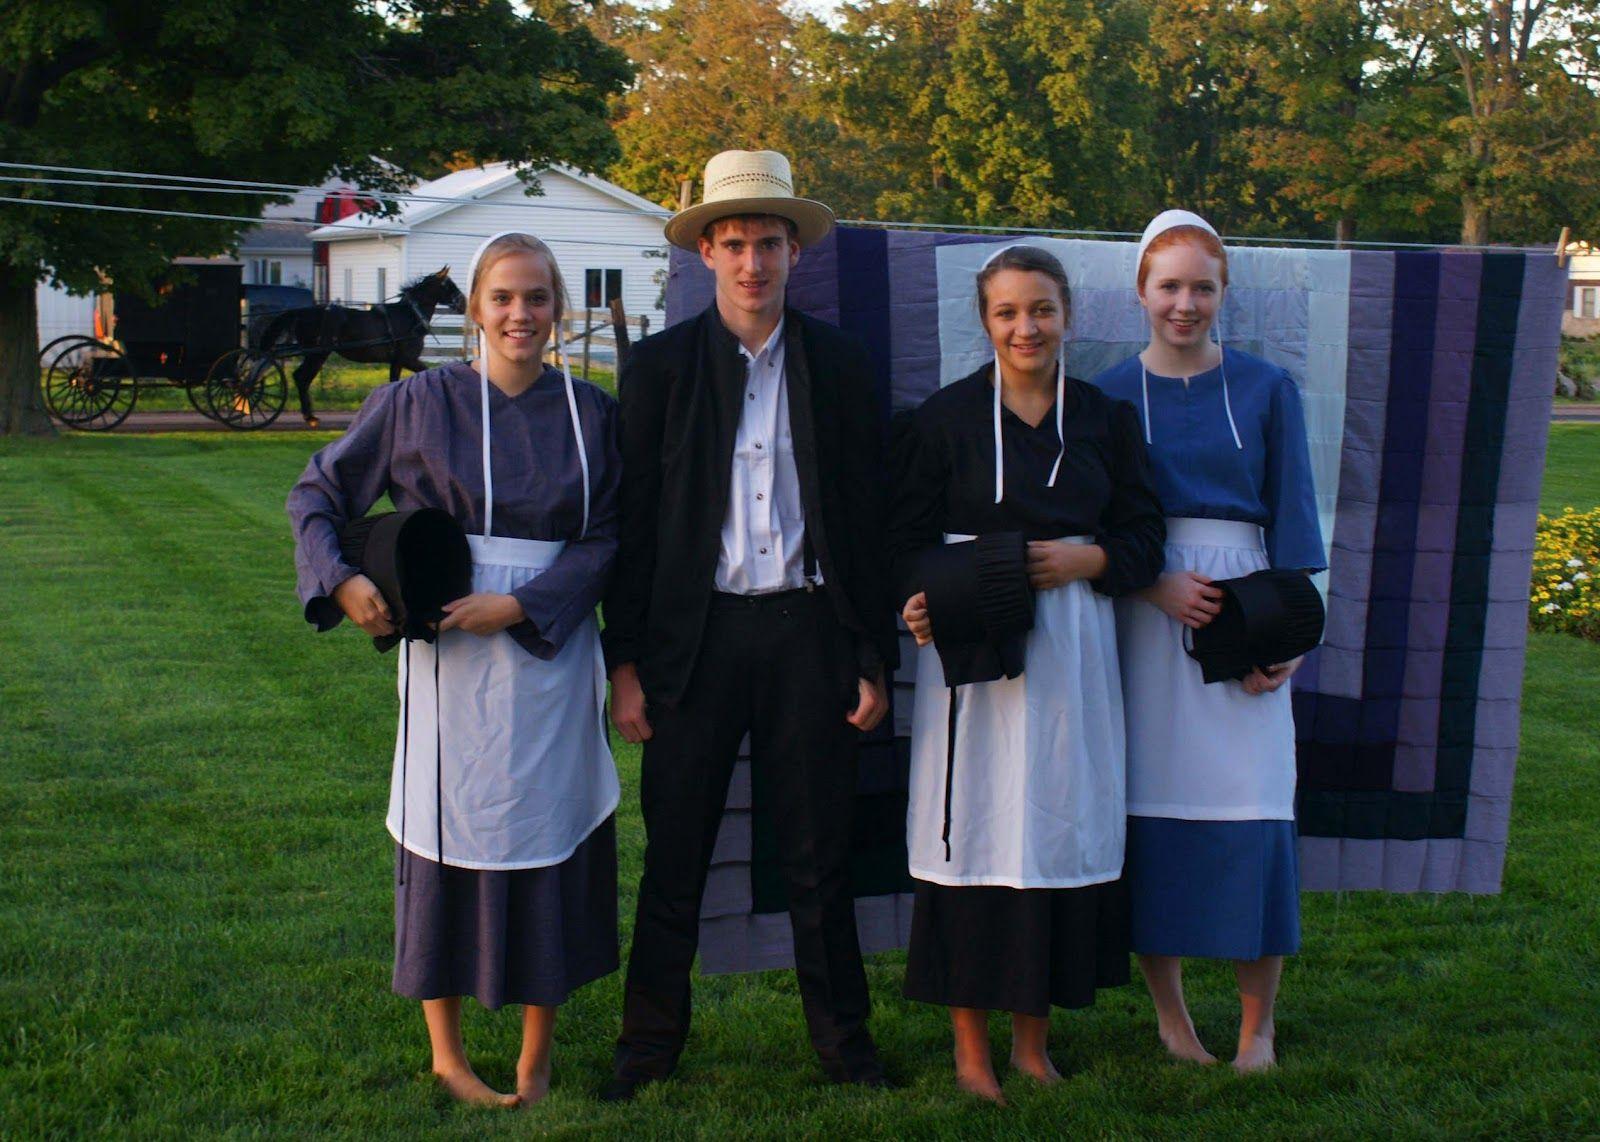 Model Womens Mennonite Cape Modest Cape Modest Dresses Size Dresses Dress